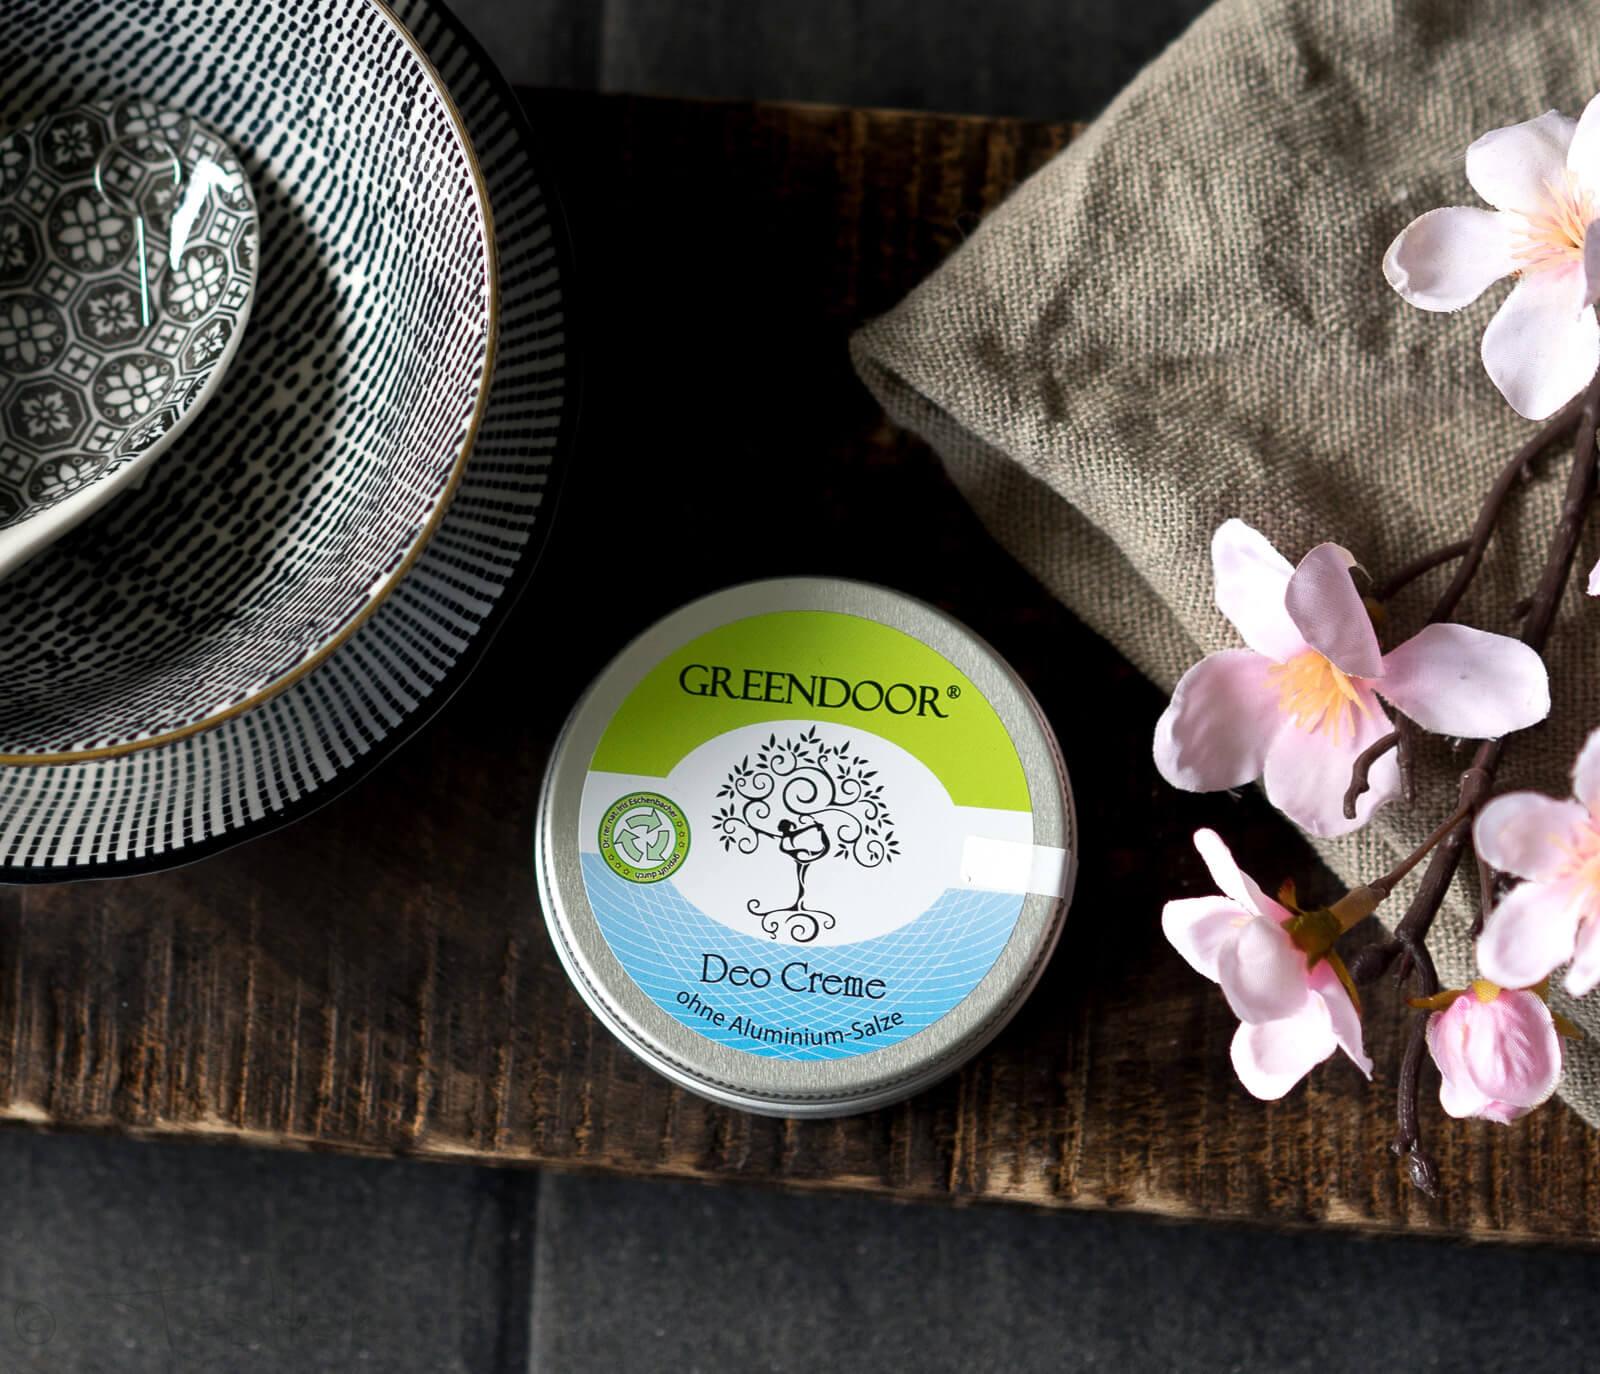 Wirksame Deo Creme, Deodorant ohne Aluminium - Vegane Naturkosmetik Cremedeo ohne Alkohol